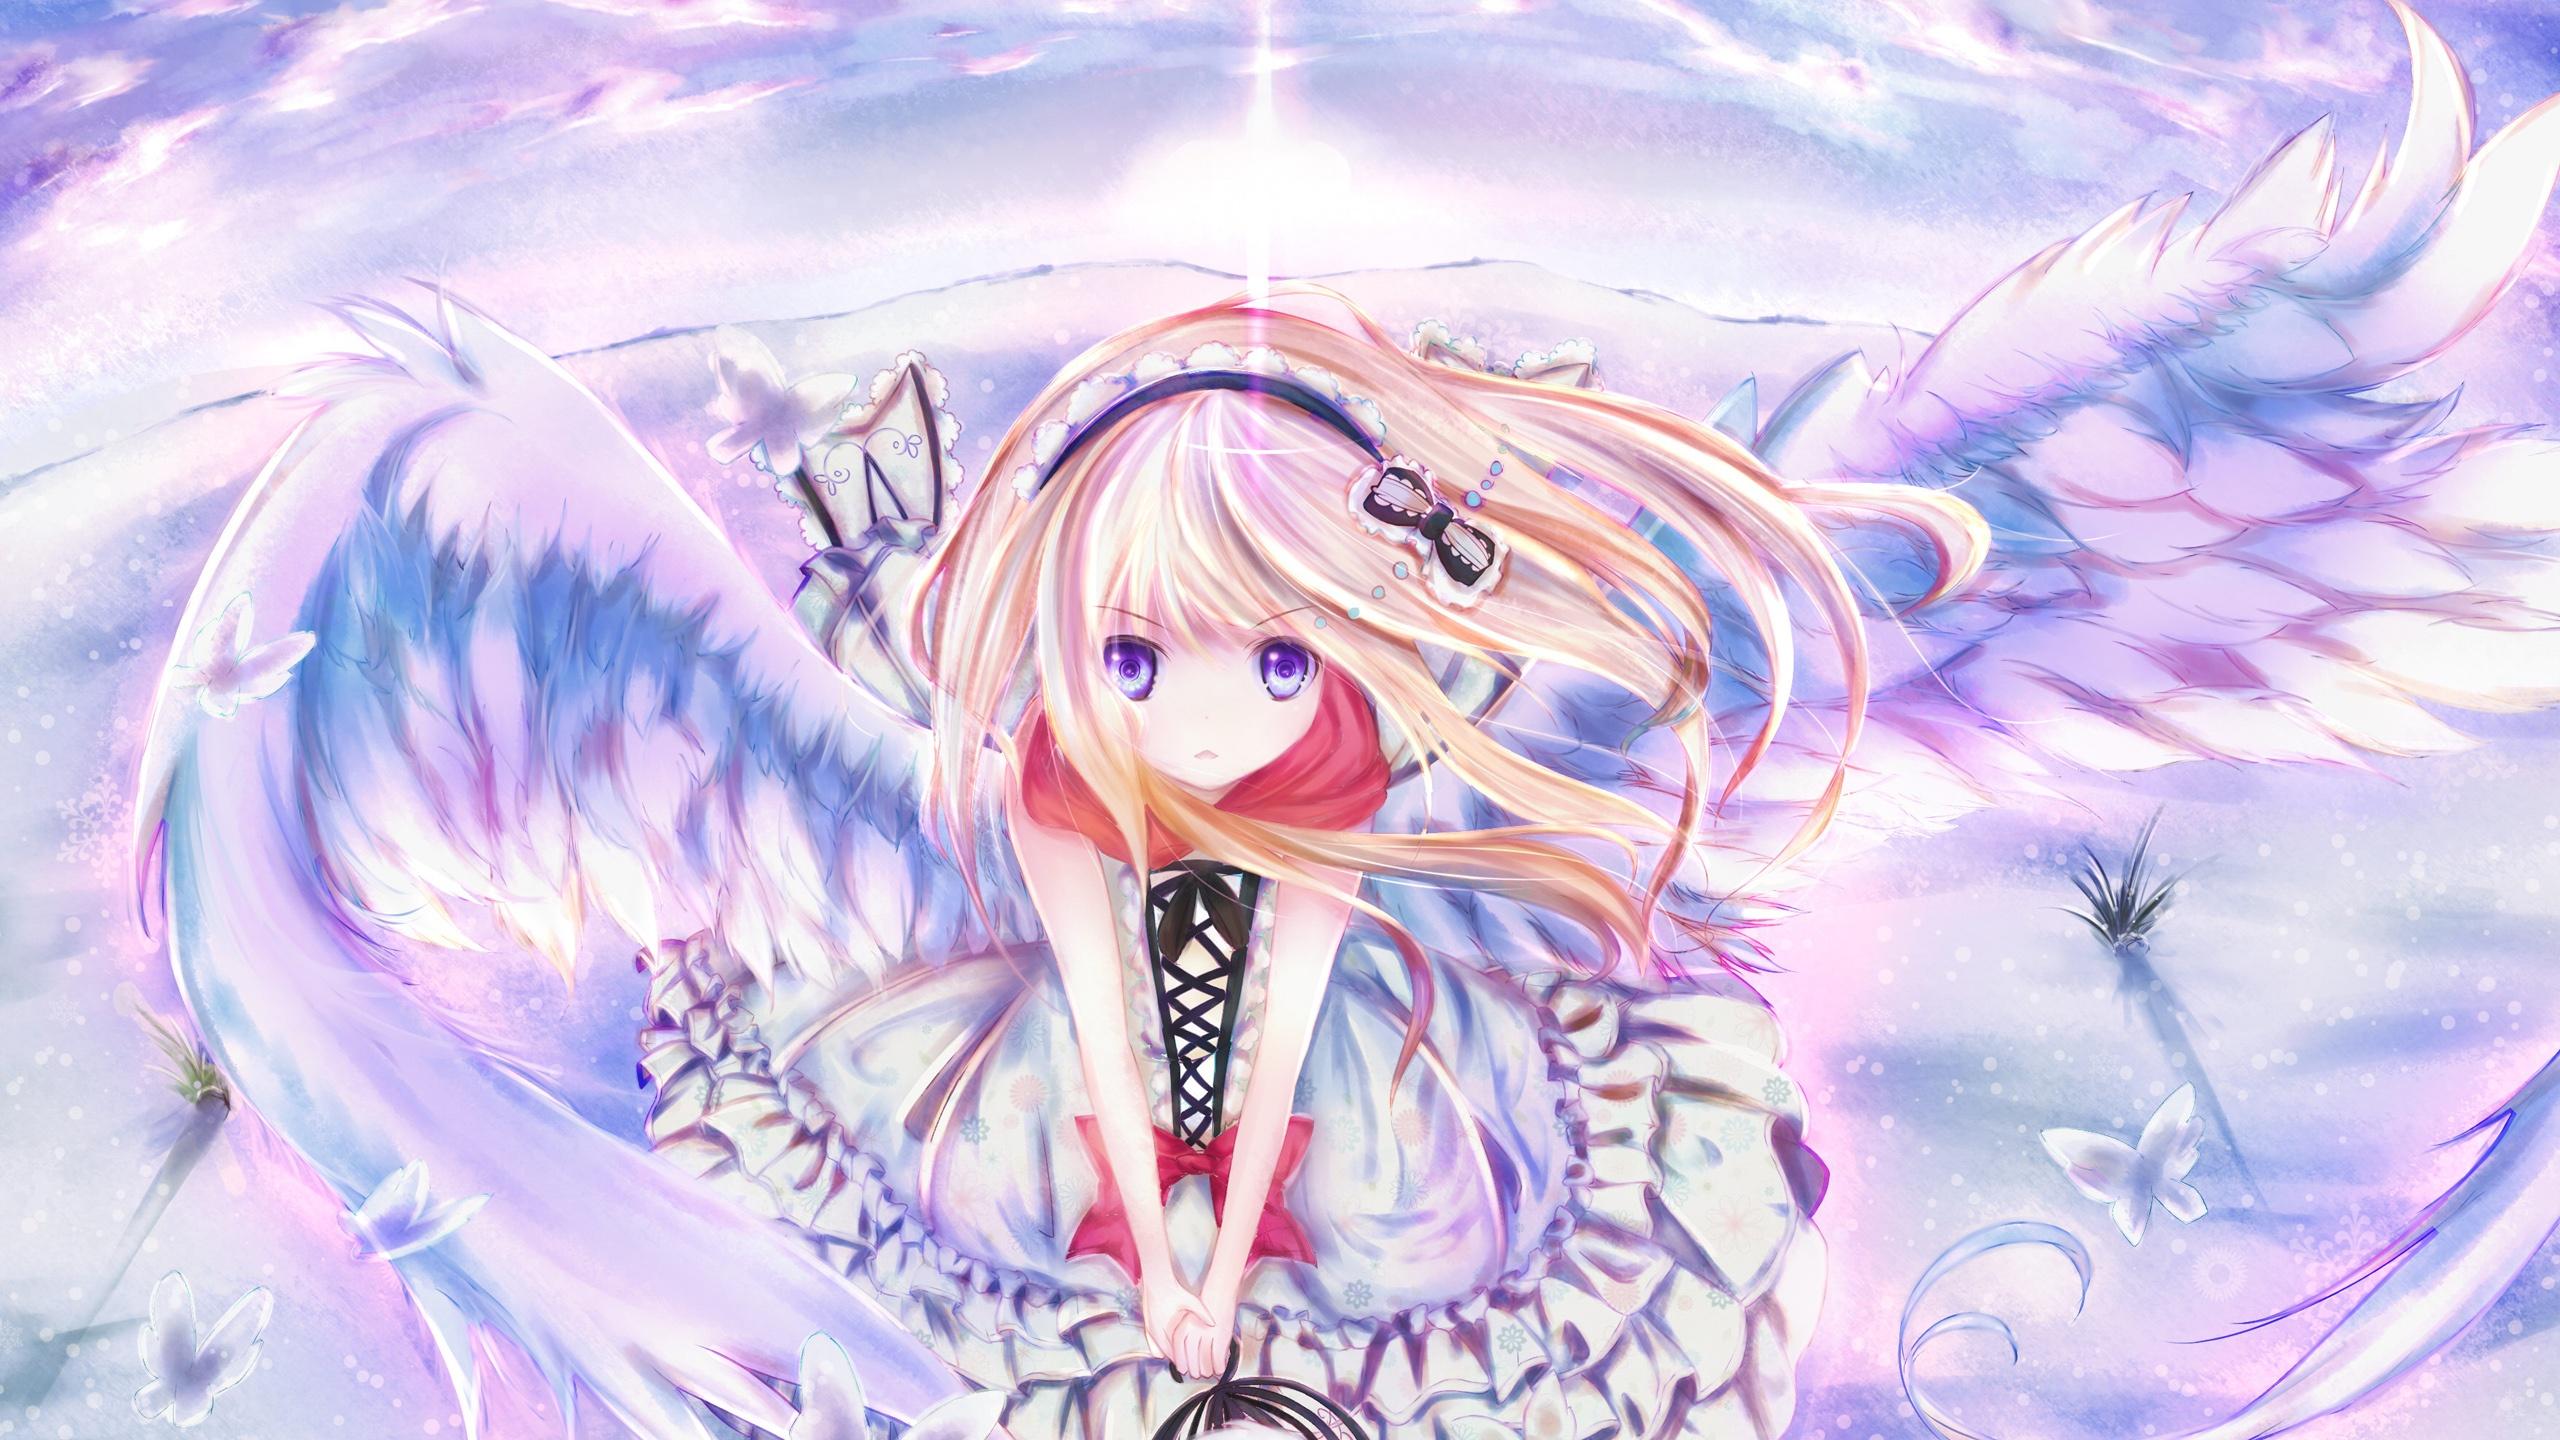 35 2560 X 1440 Wallpaper Anime On Wallpapersafari